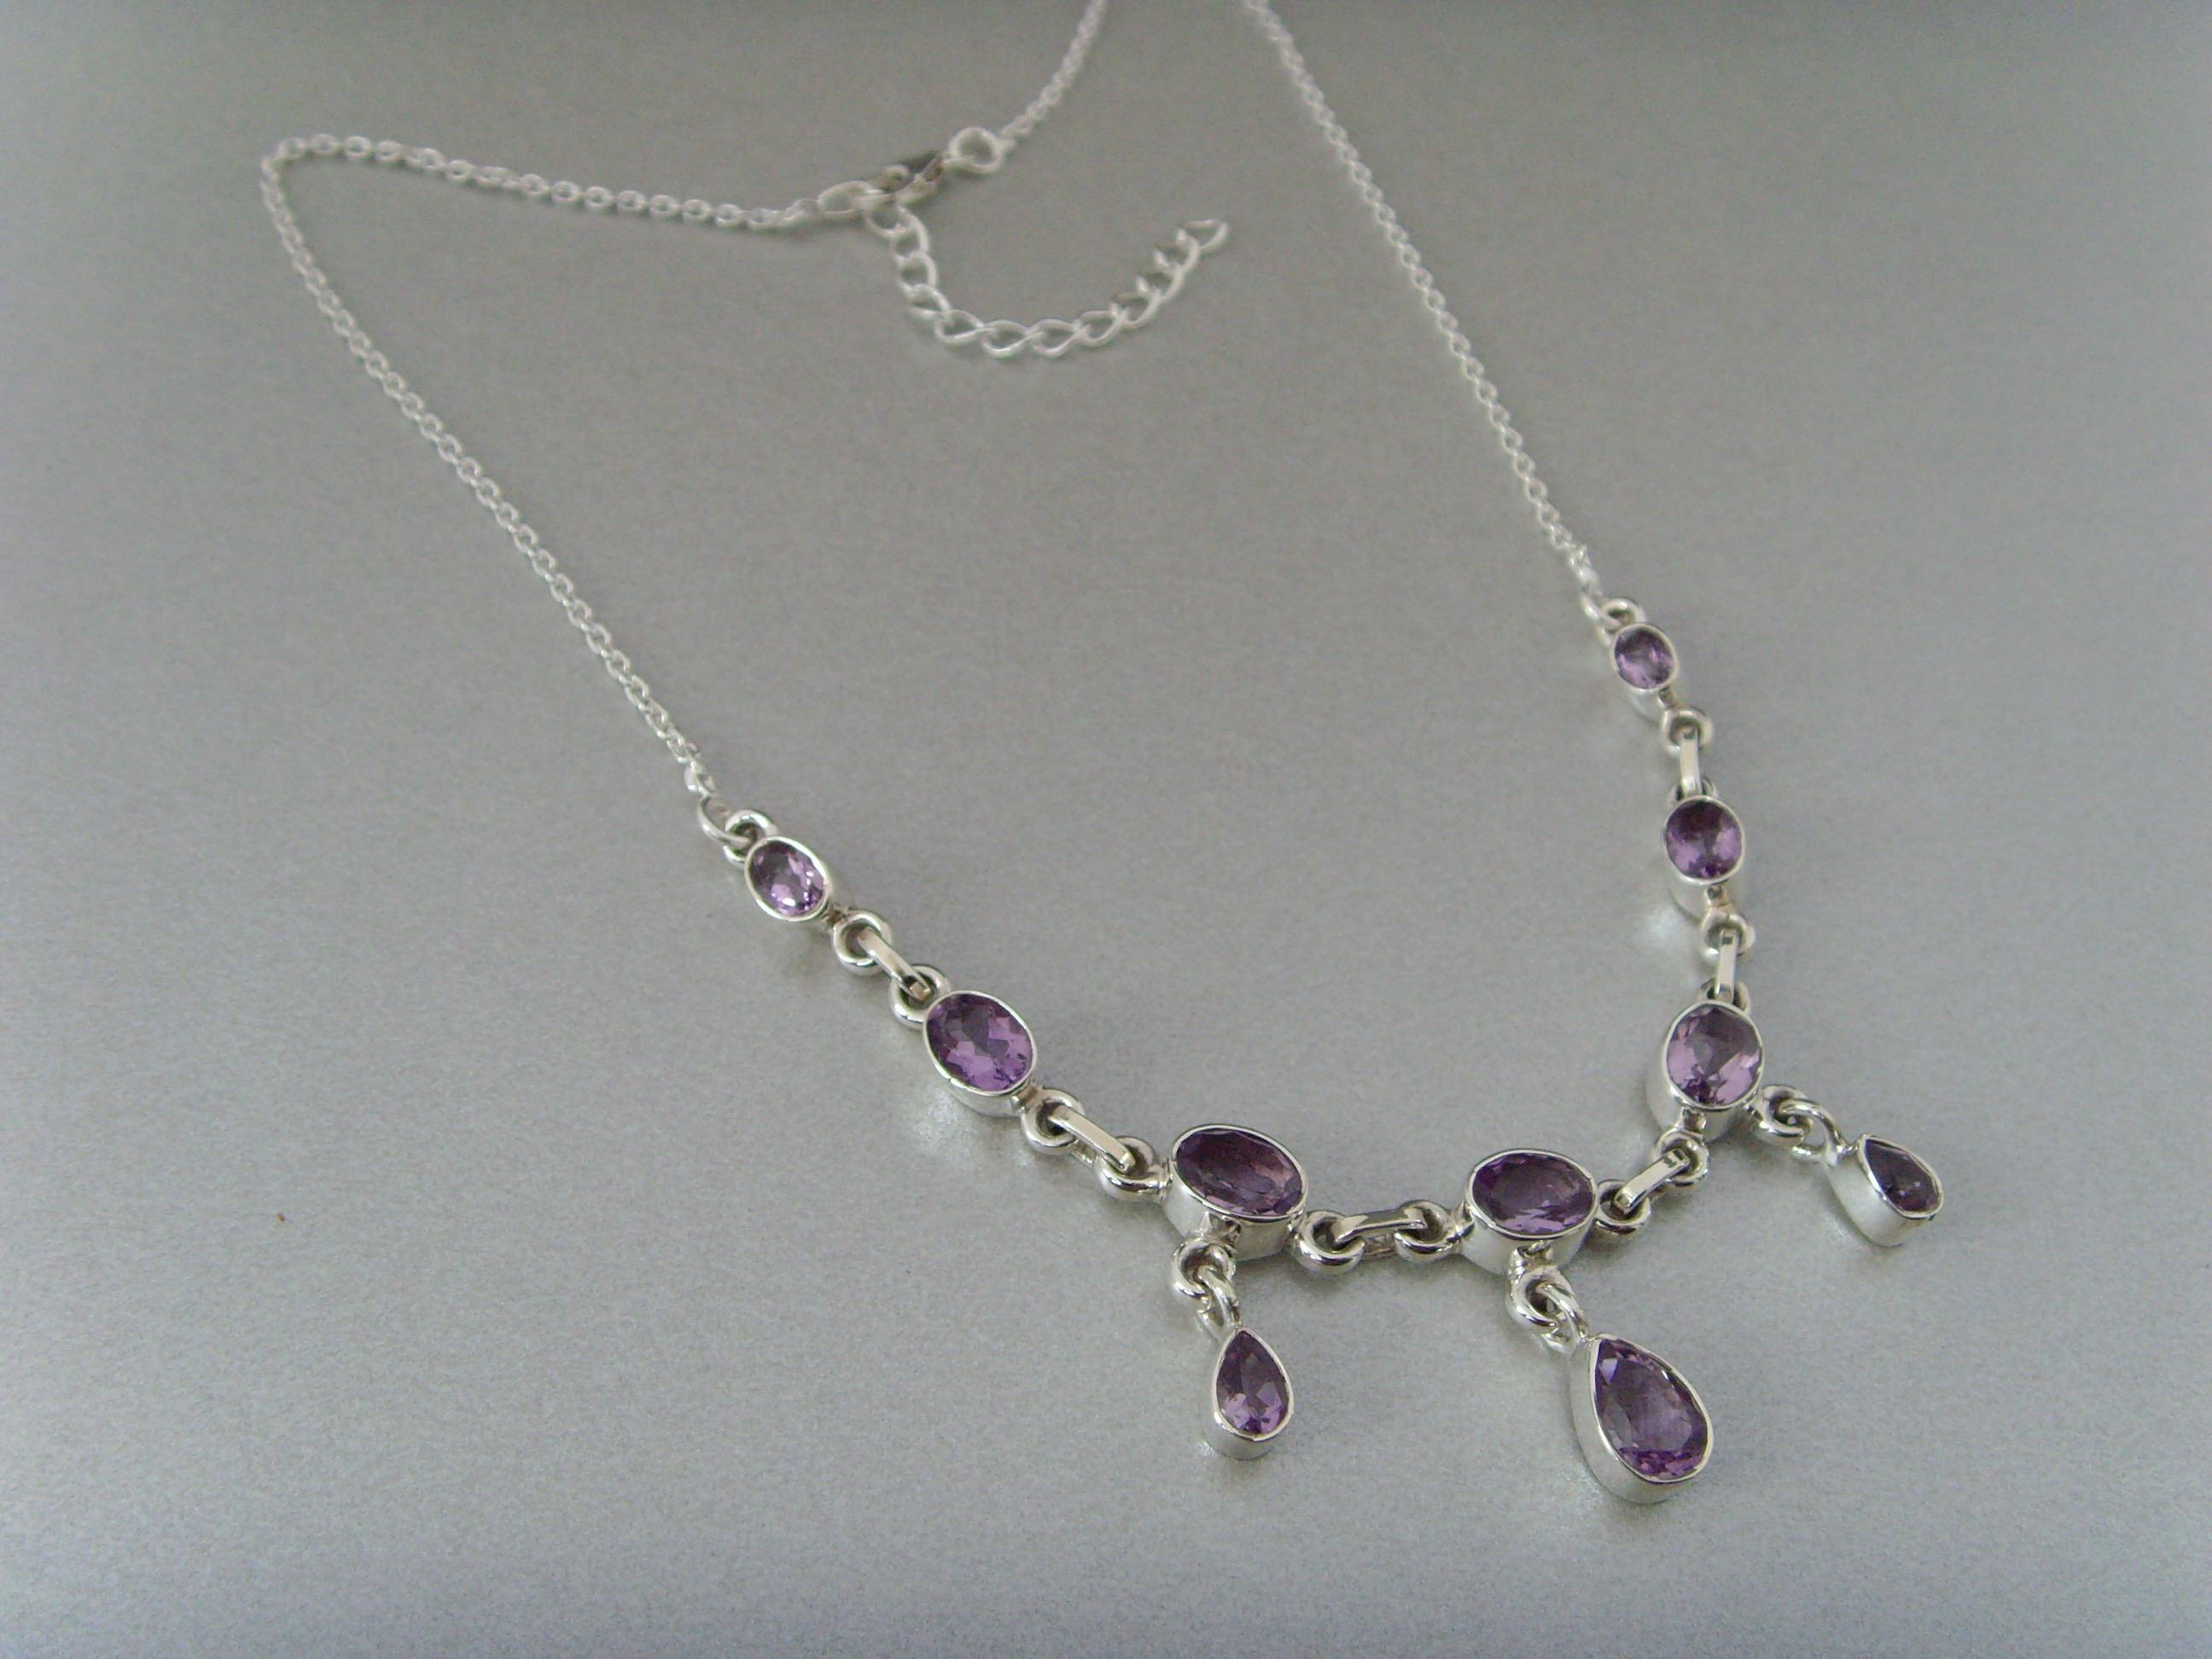 Amethyst - Collier / 925 Silber